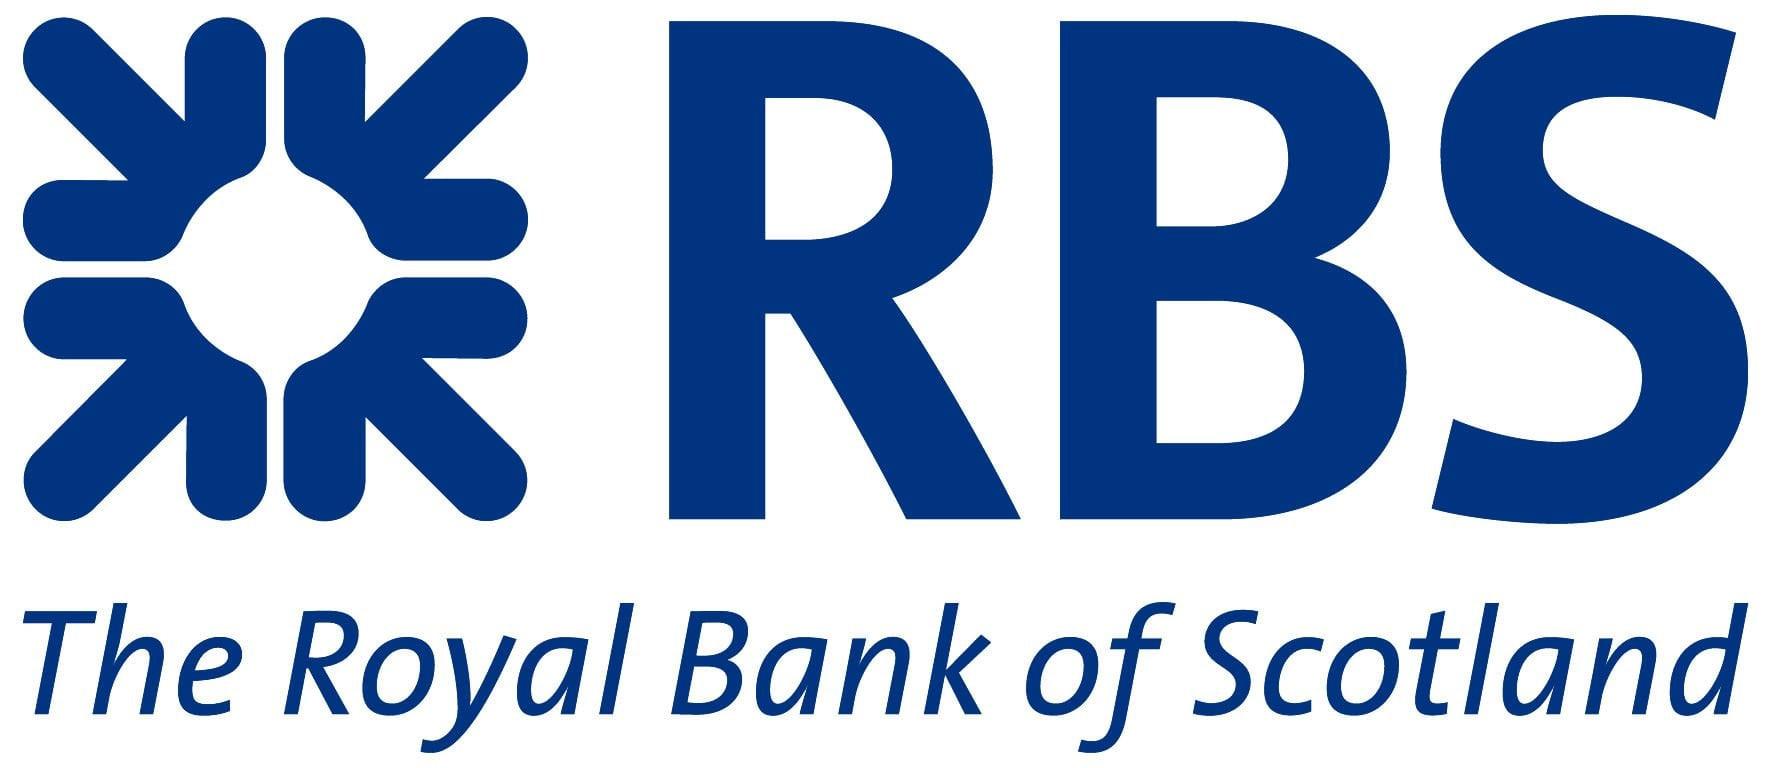 Royal-Bank-of-Scotland-Logo.jpg